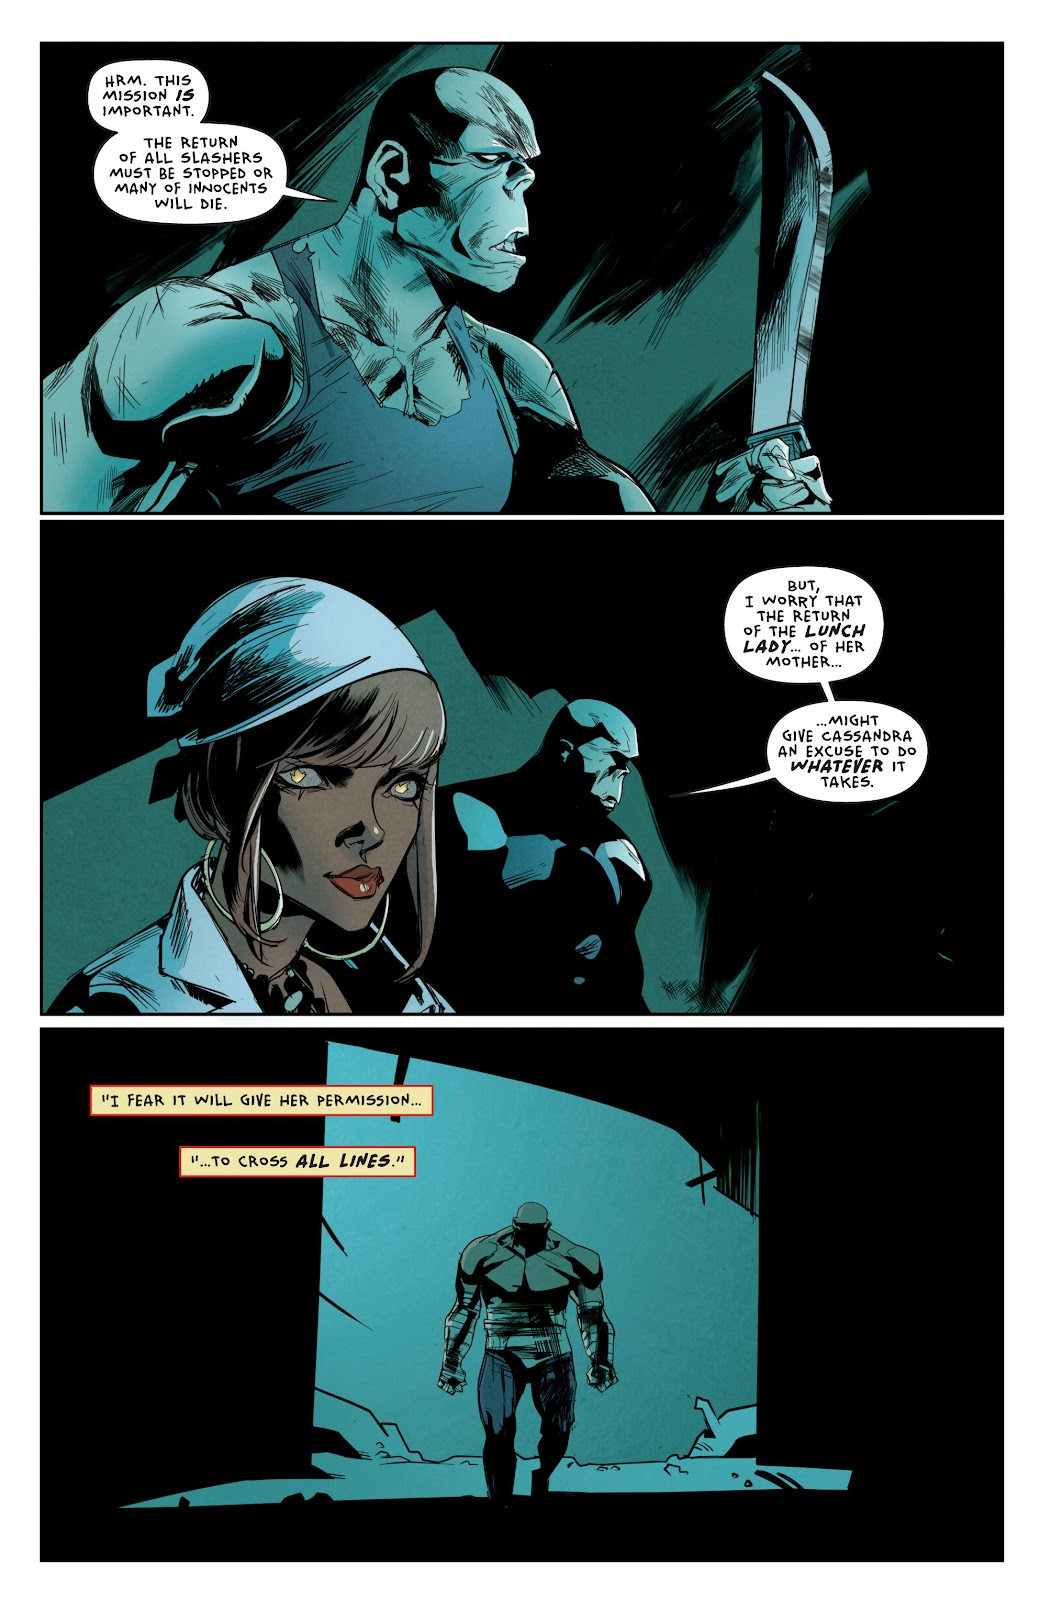 Read online Hack/Slash vs. Chaos comic -  Issue #3 - 11